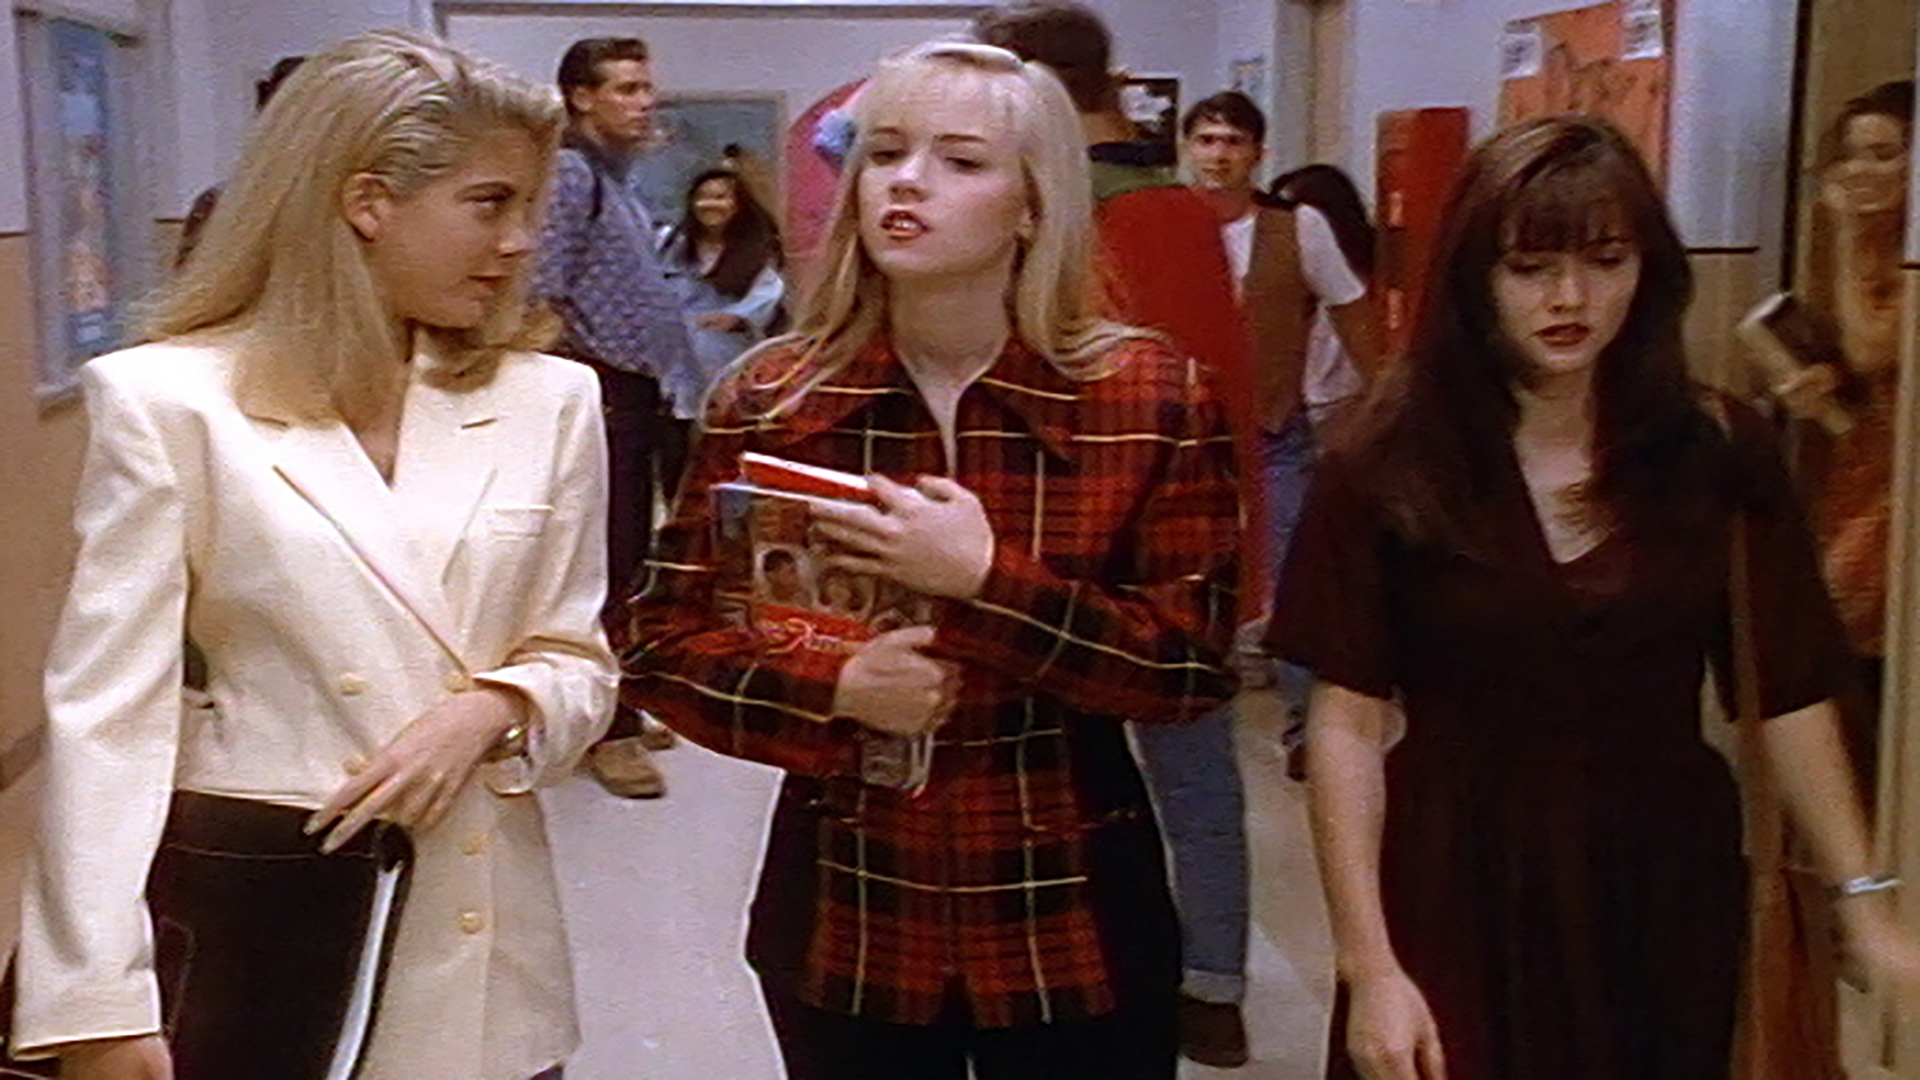 Беверли-Хиллз, 90210 (Beverly Hills, 90210) 1990 - 2000